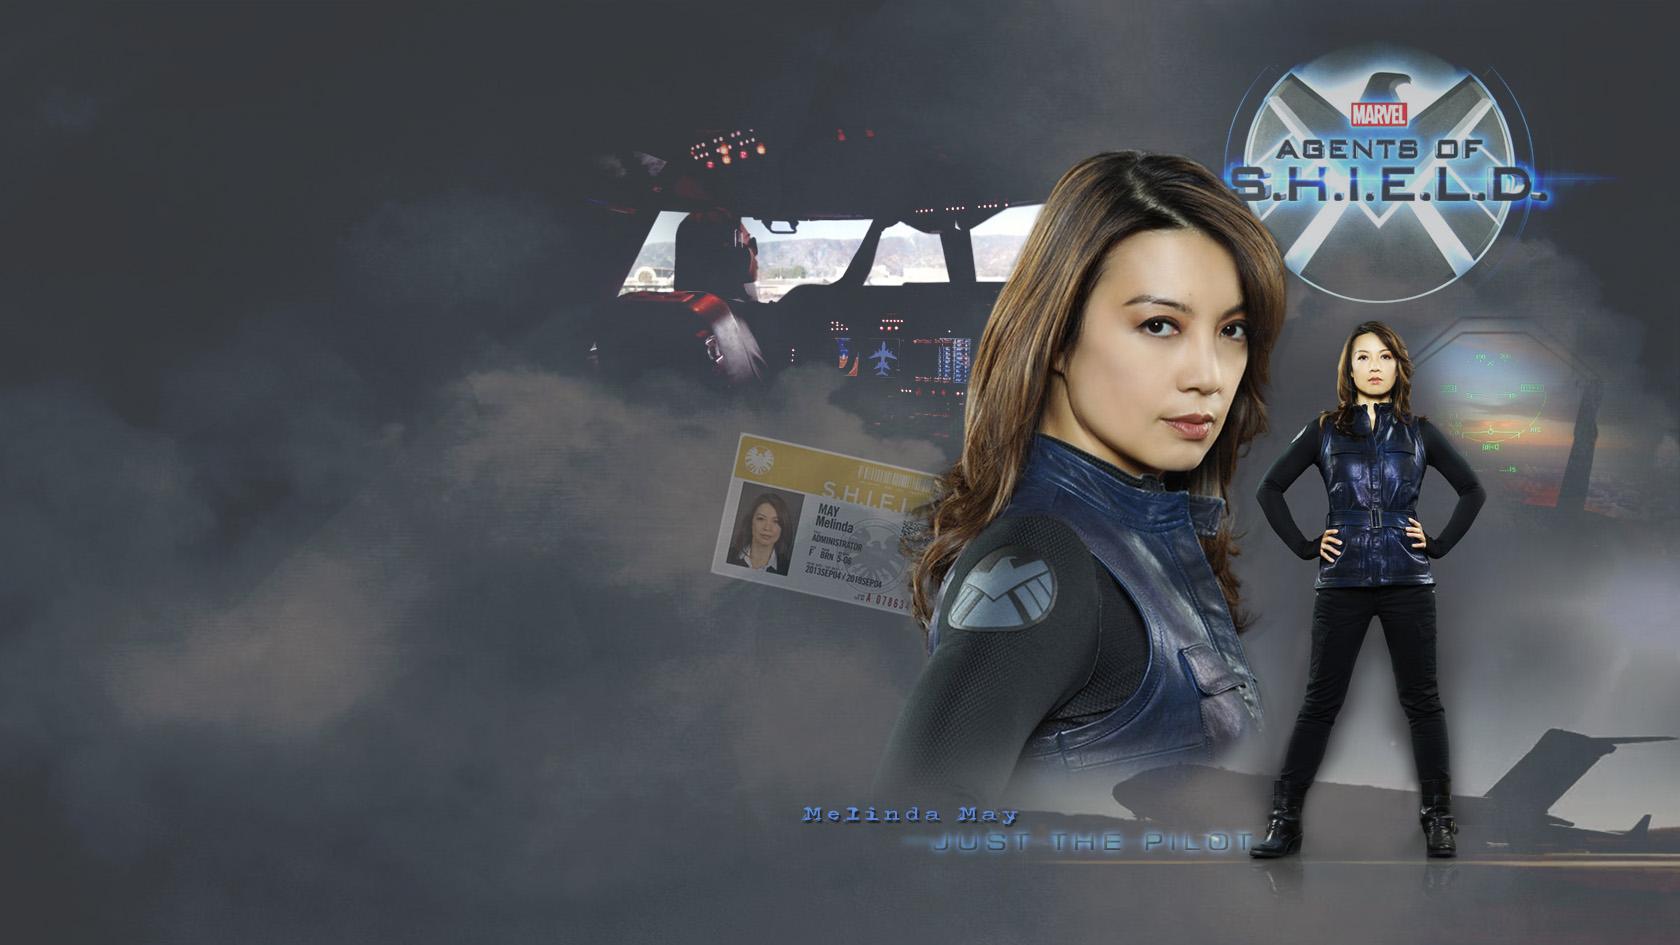 Agents of Shield wallpaper 22 1680x945